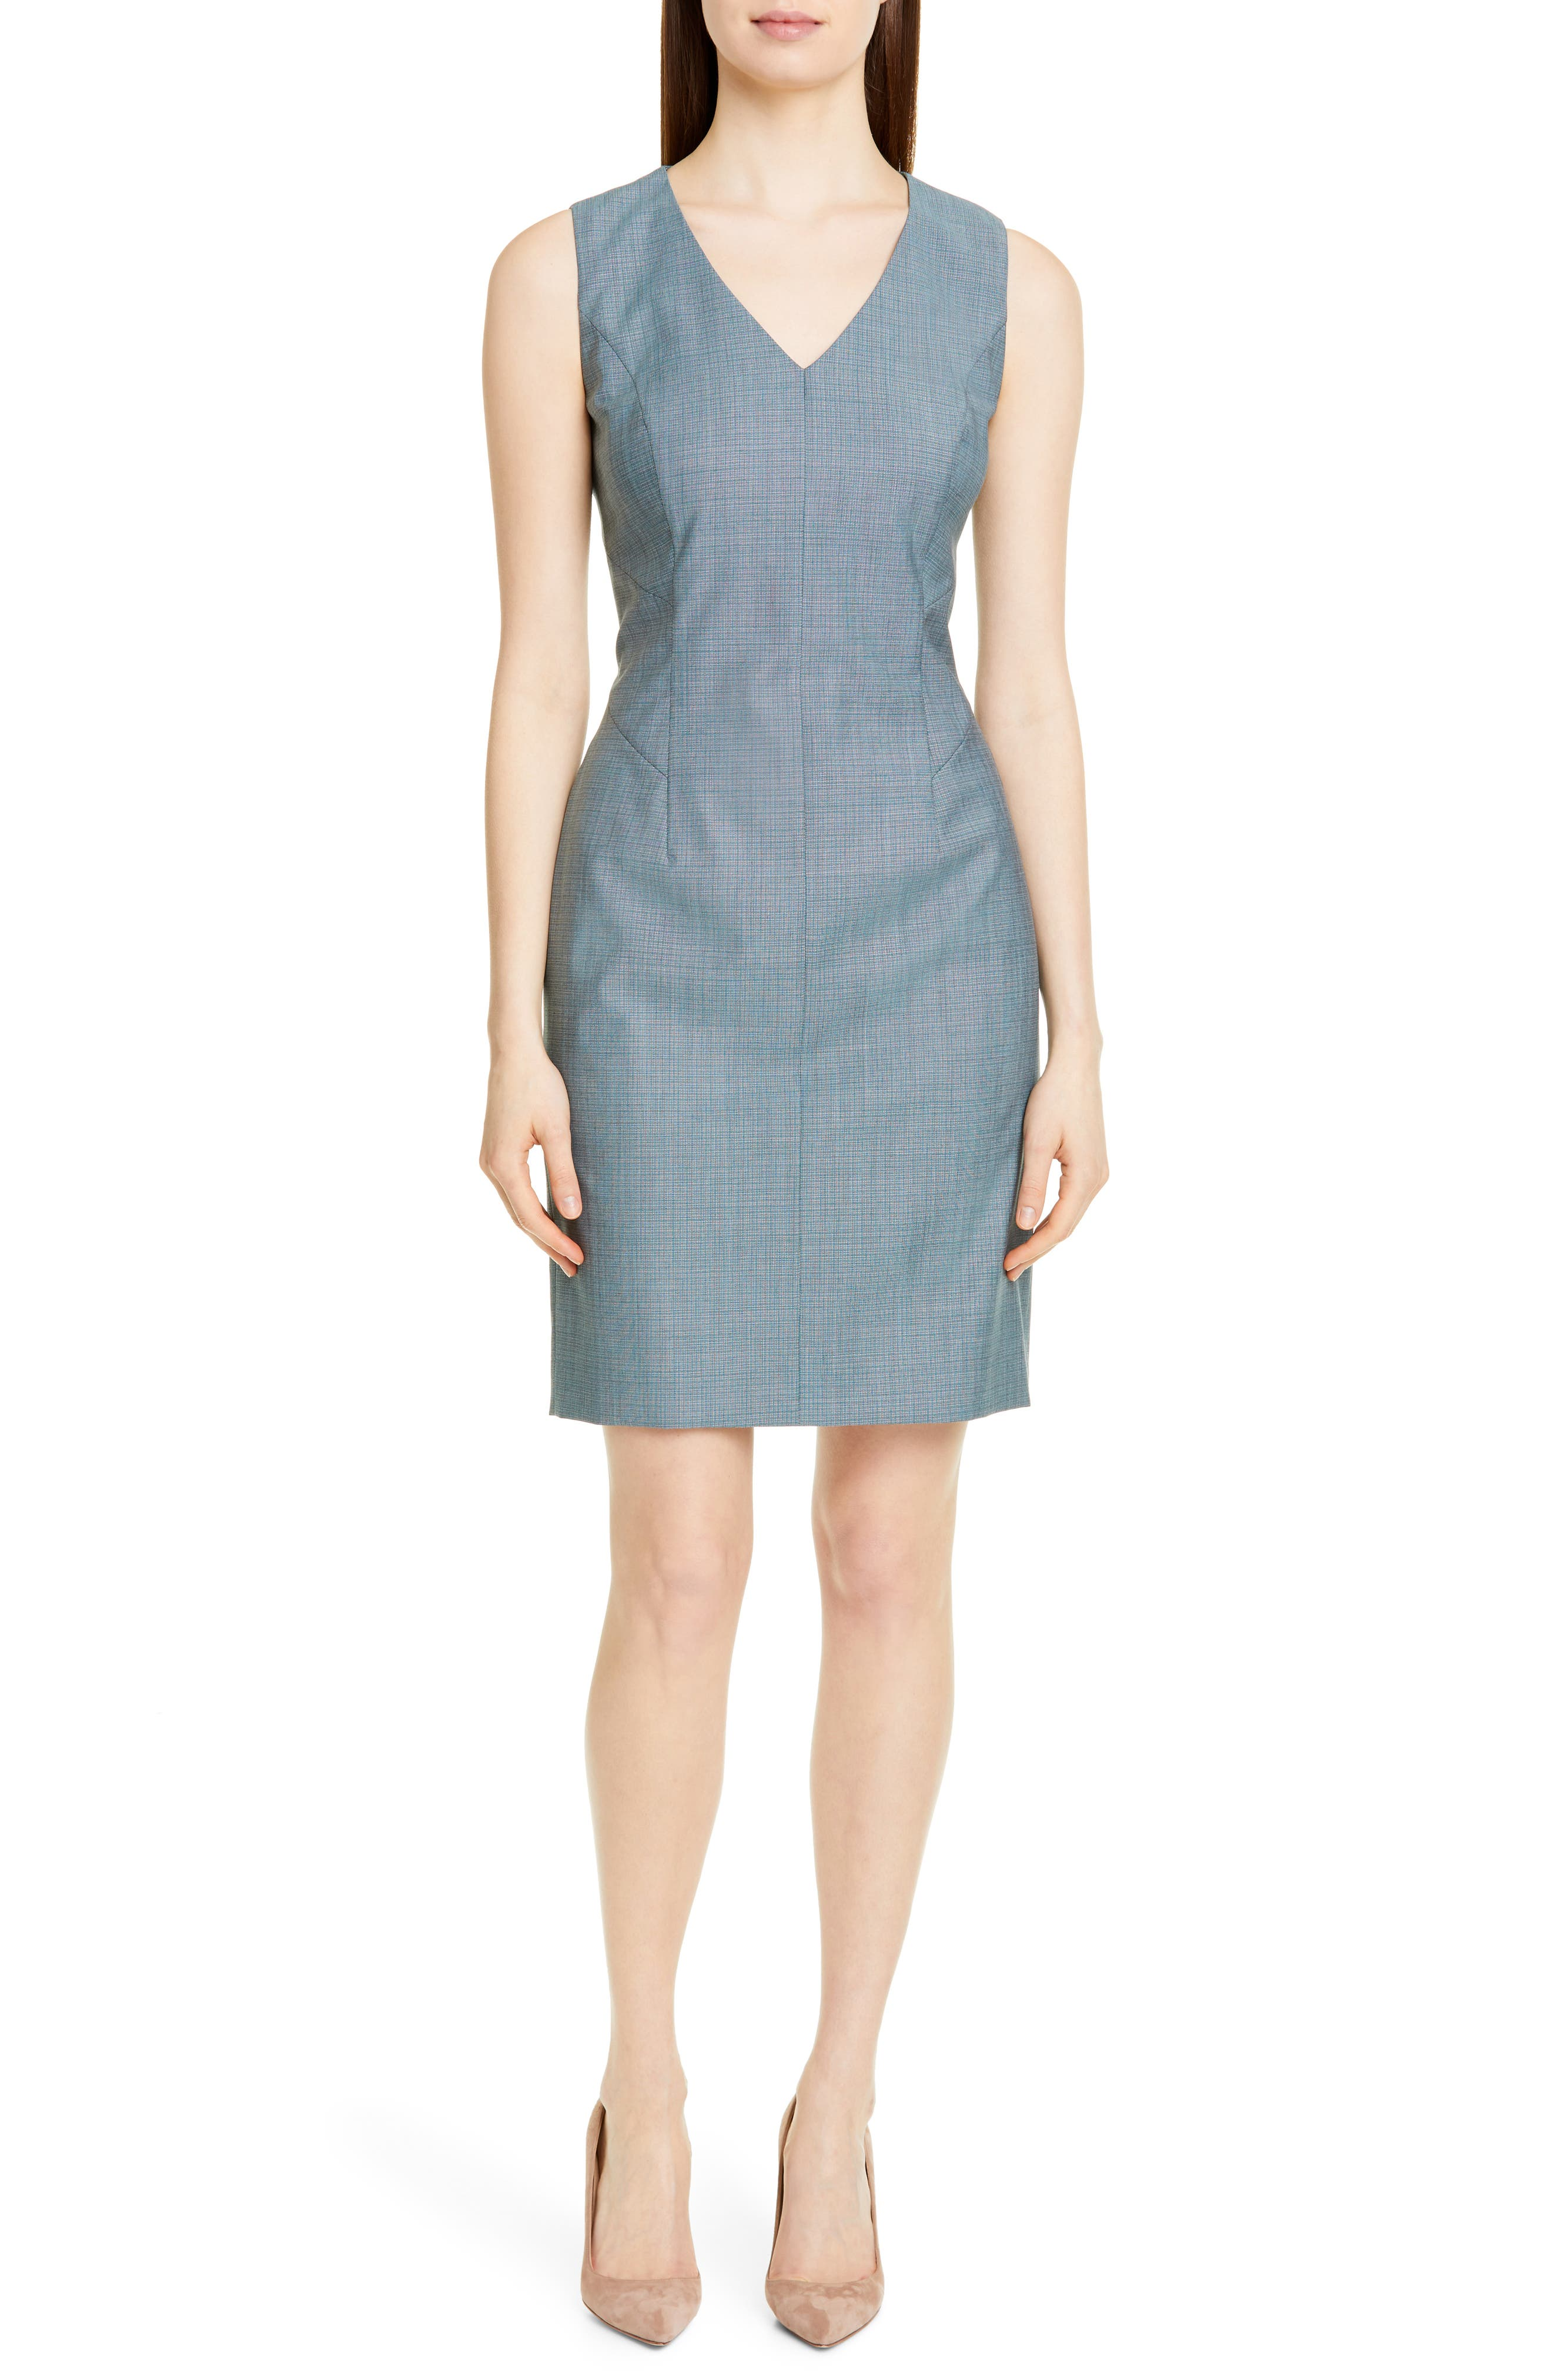 Petite Boss Dictana Microcheck Wool Sheath Dress, P - Blue/green